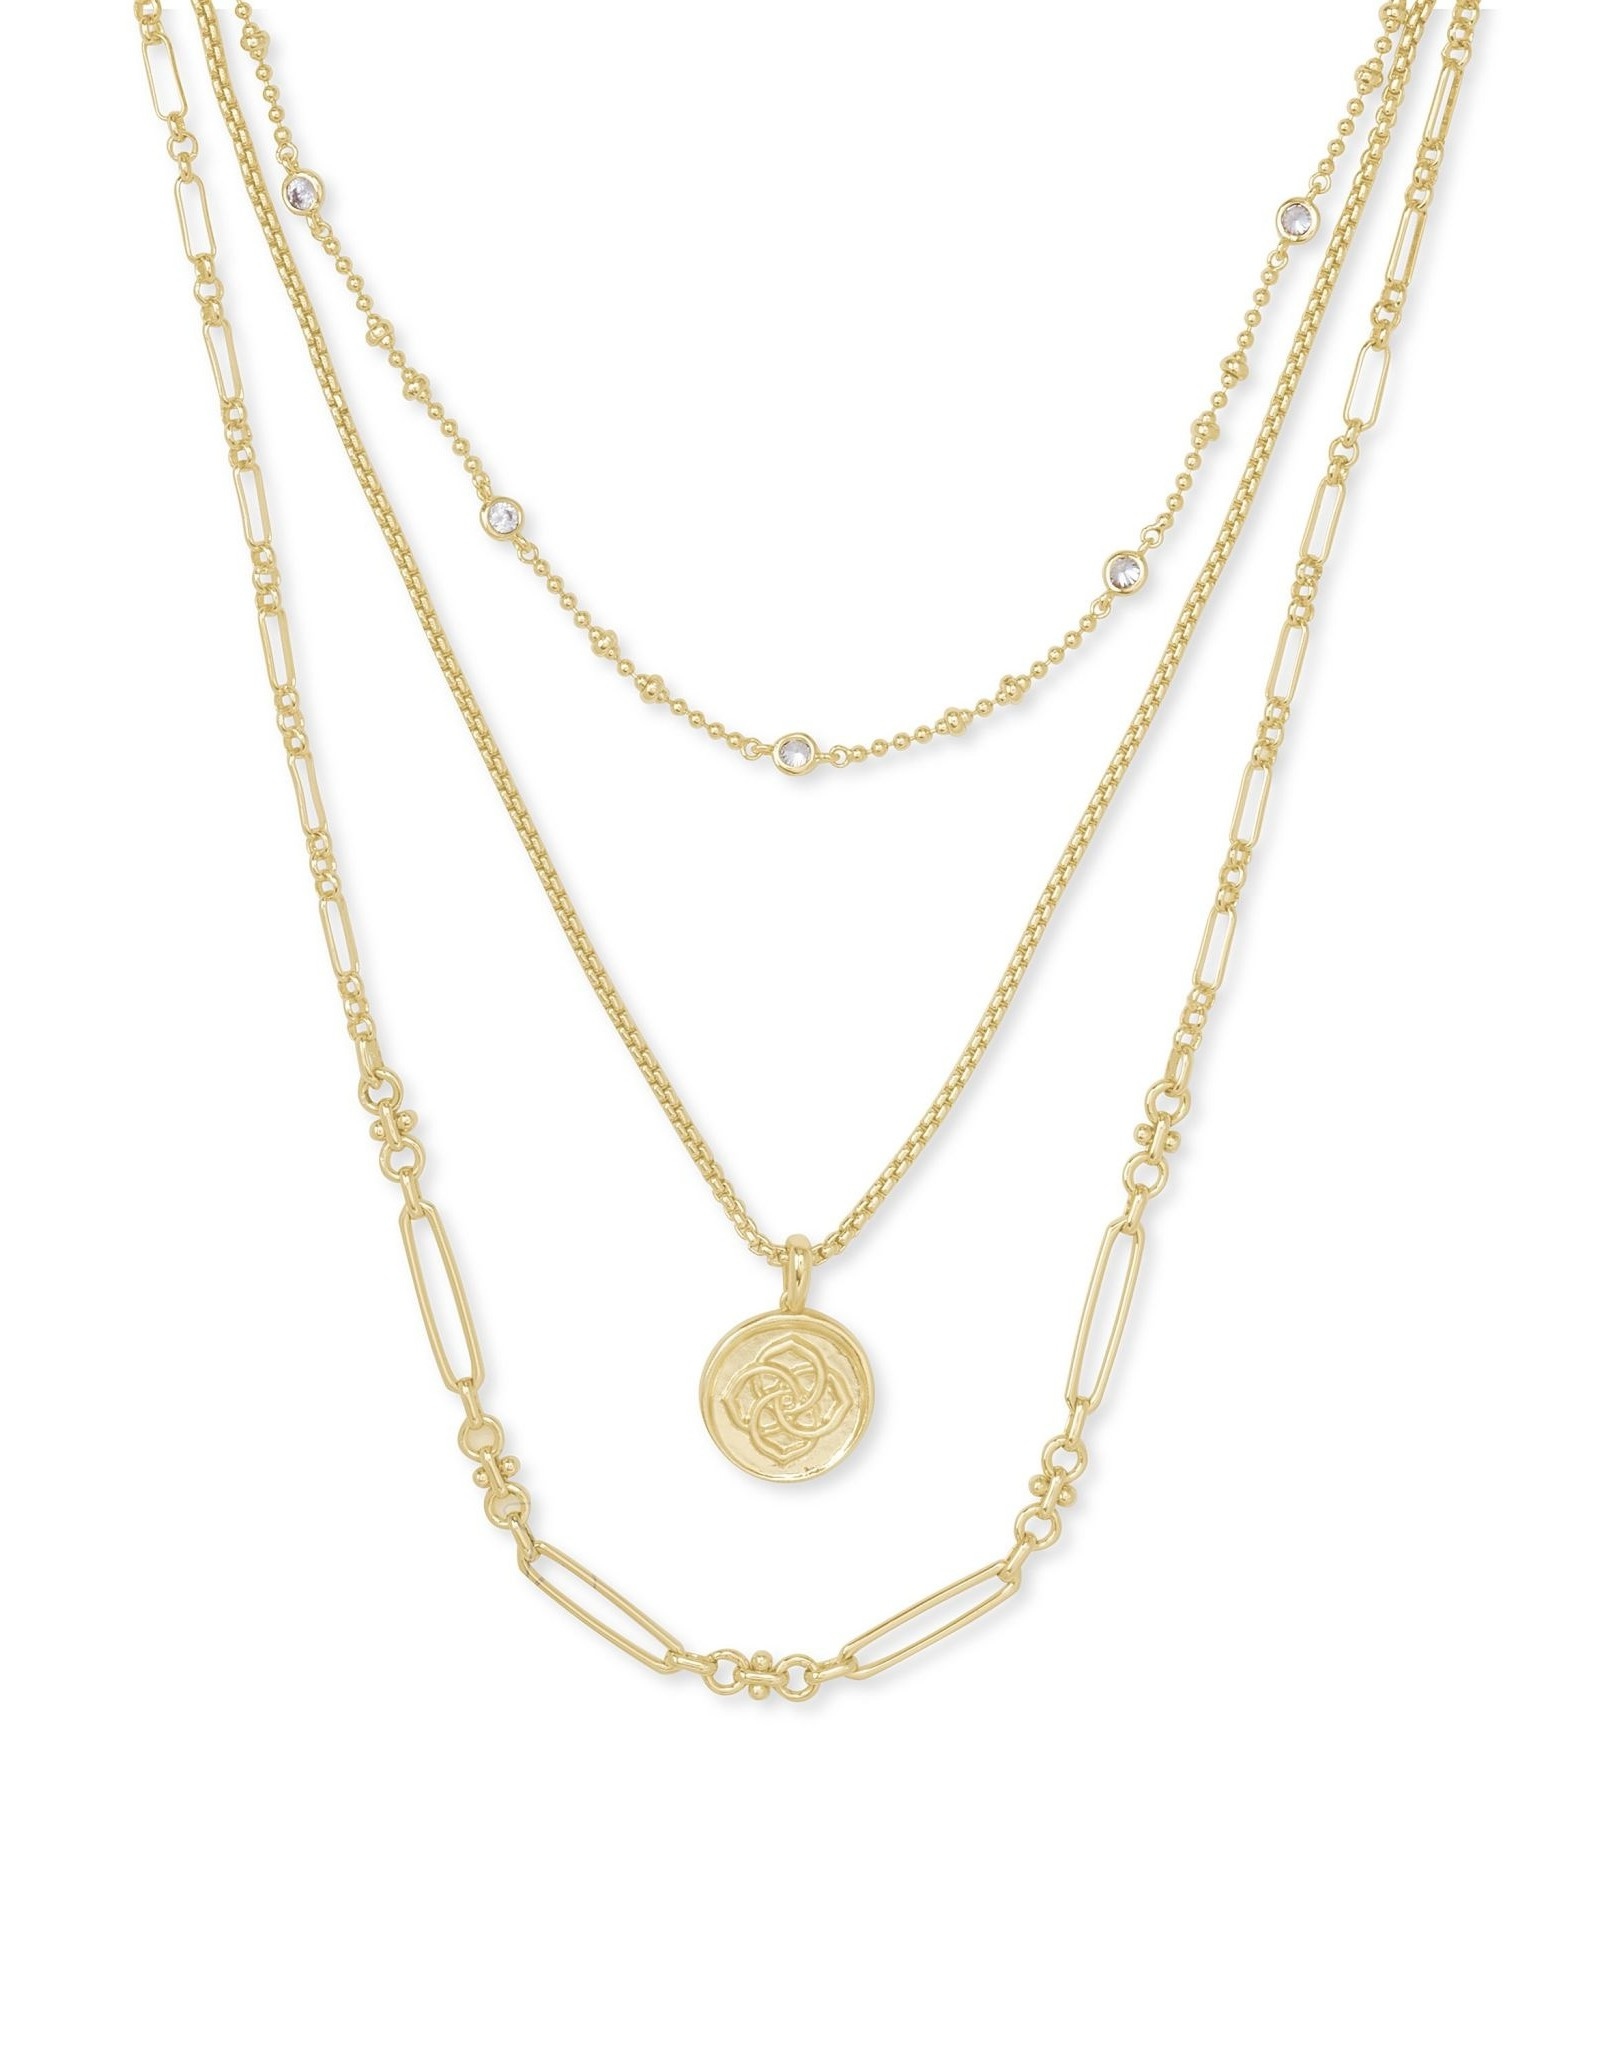 Kendra Scott Medallion Triple Strand Necklace - Gold Metal